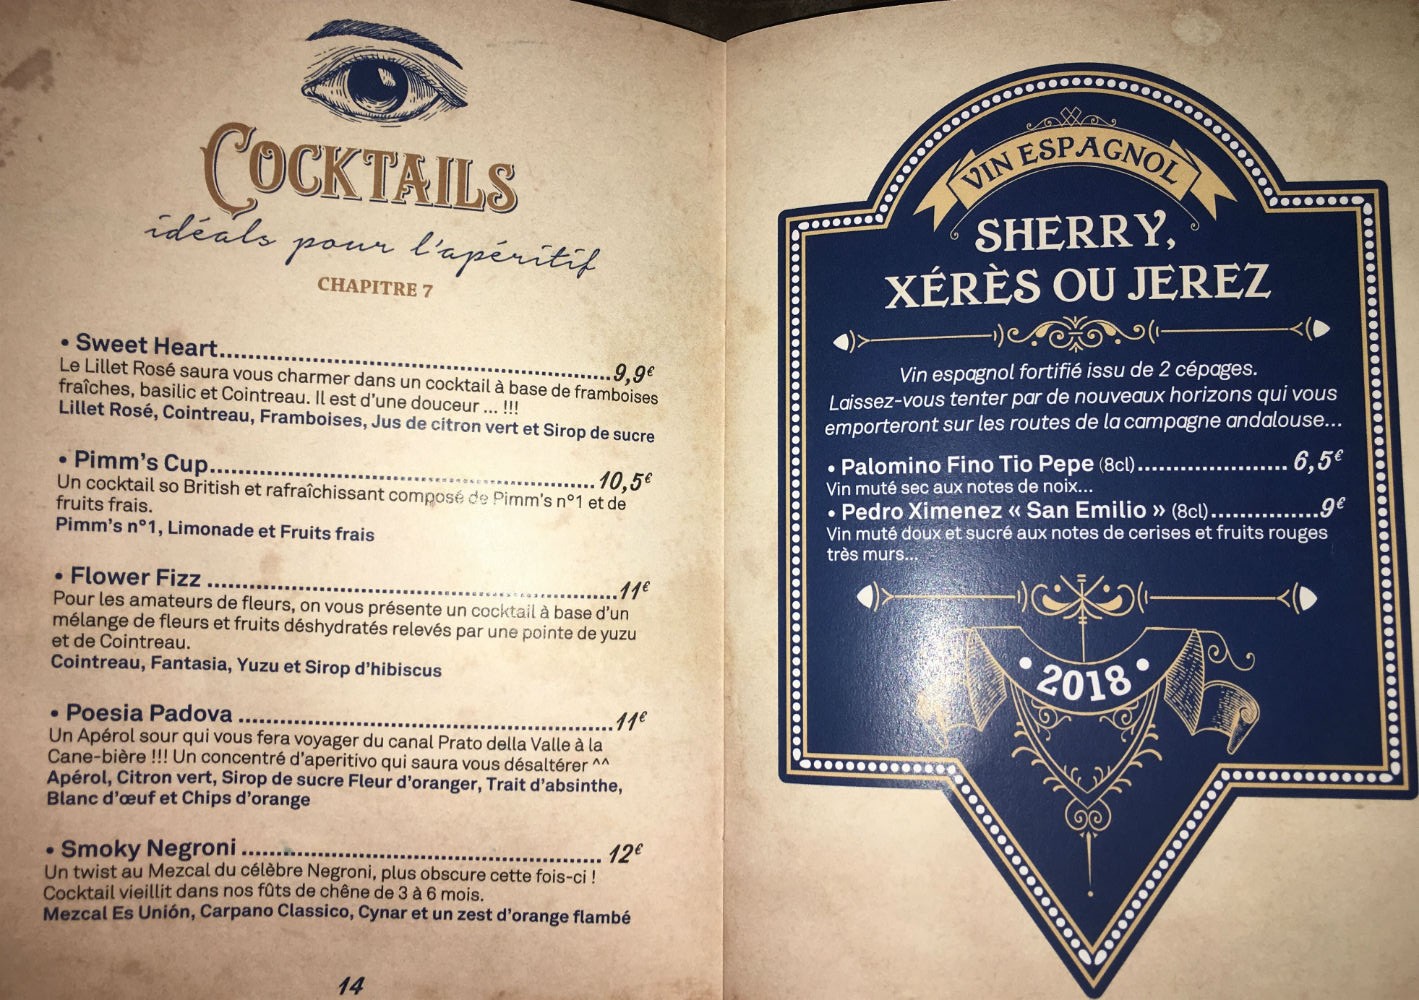 el merkado nice carte cocktail